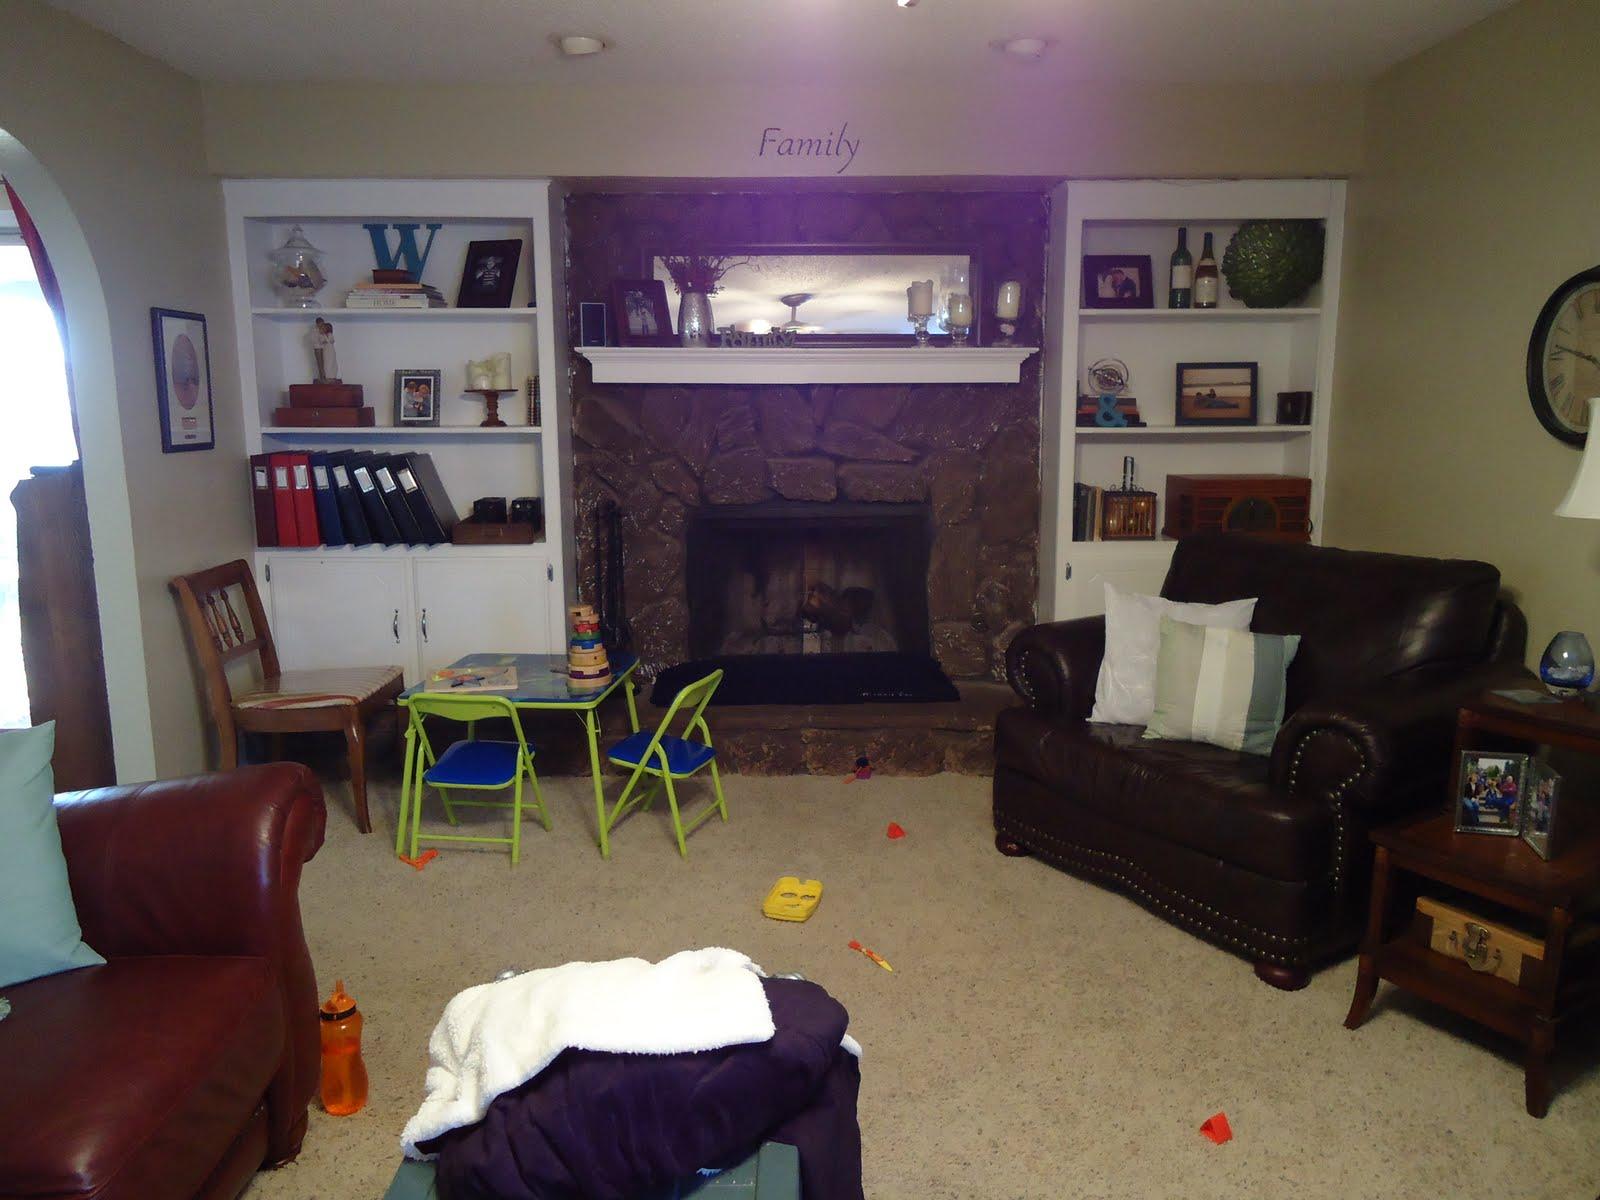 Life on Purpose: My Ugly Fireplace Redo